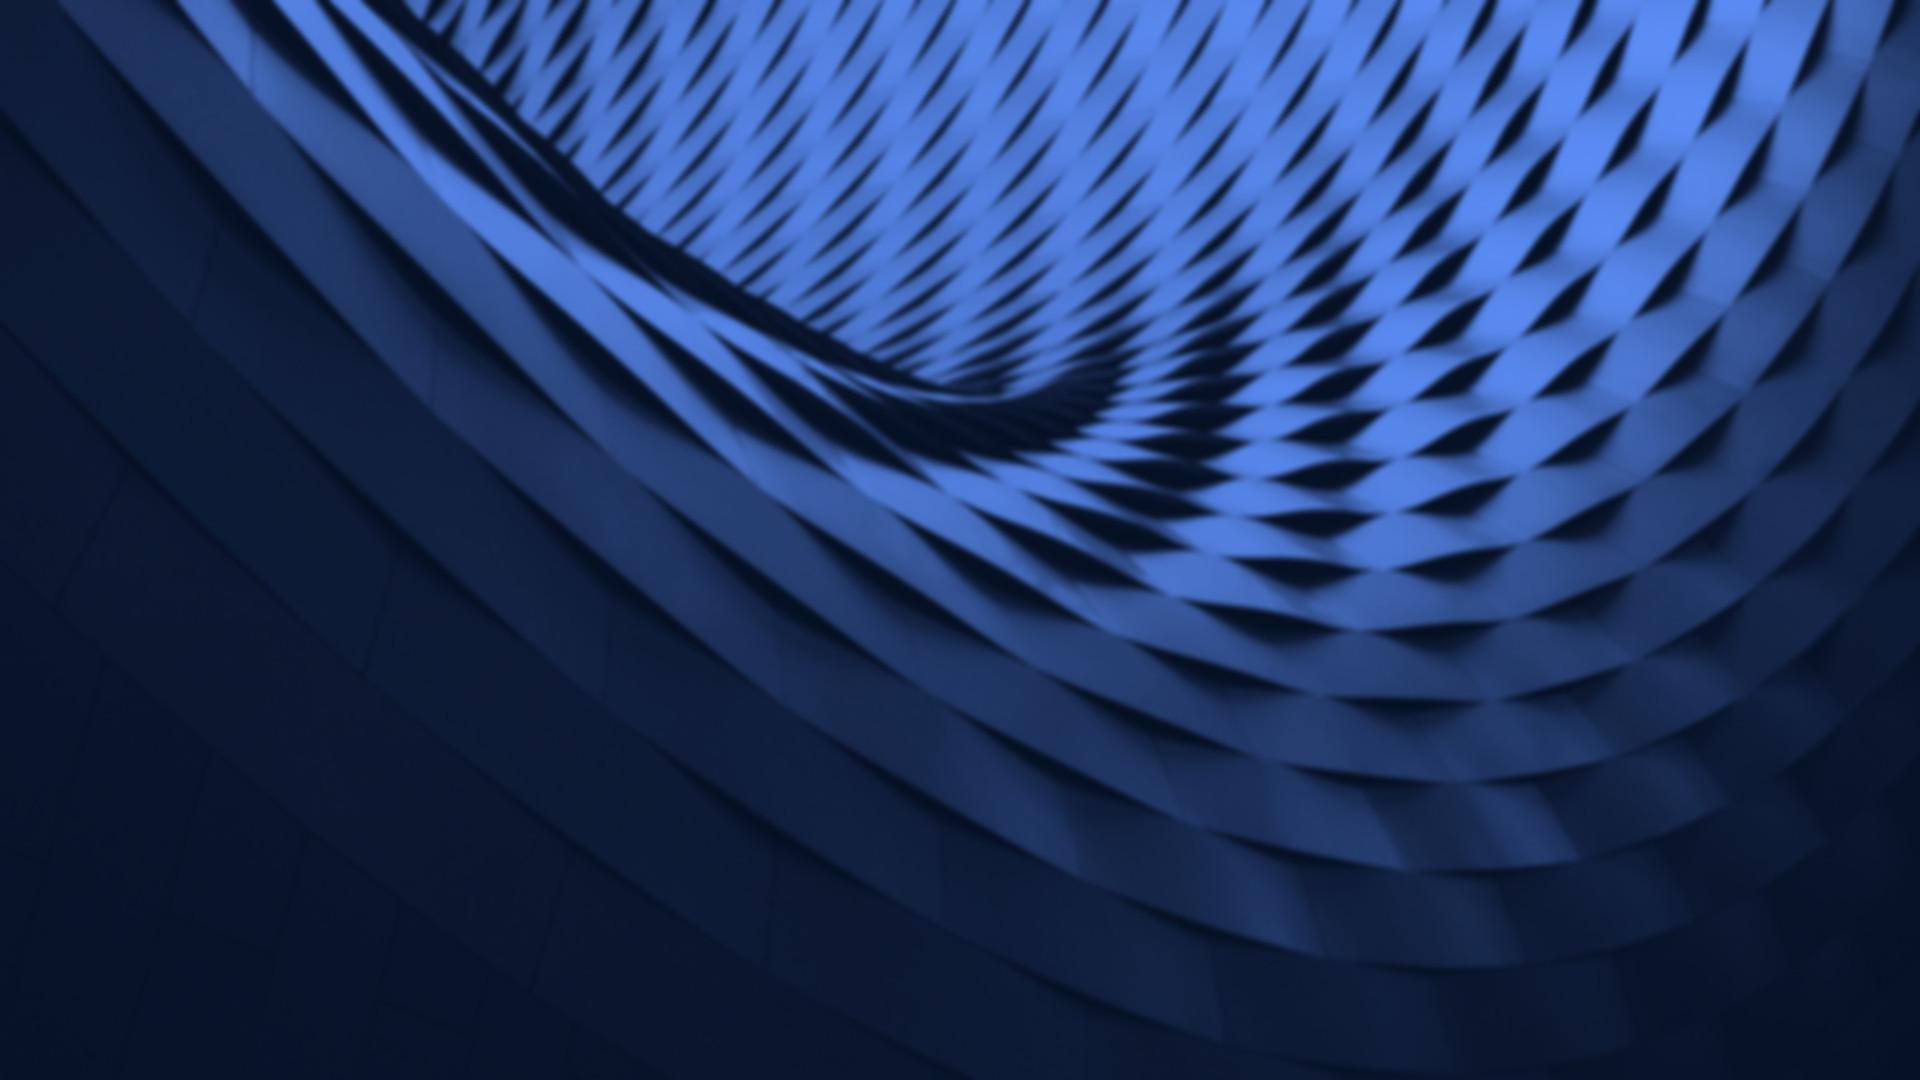 Dark Blue Shapes